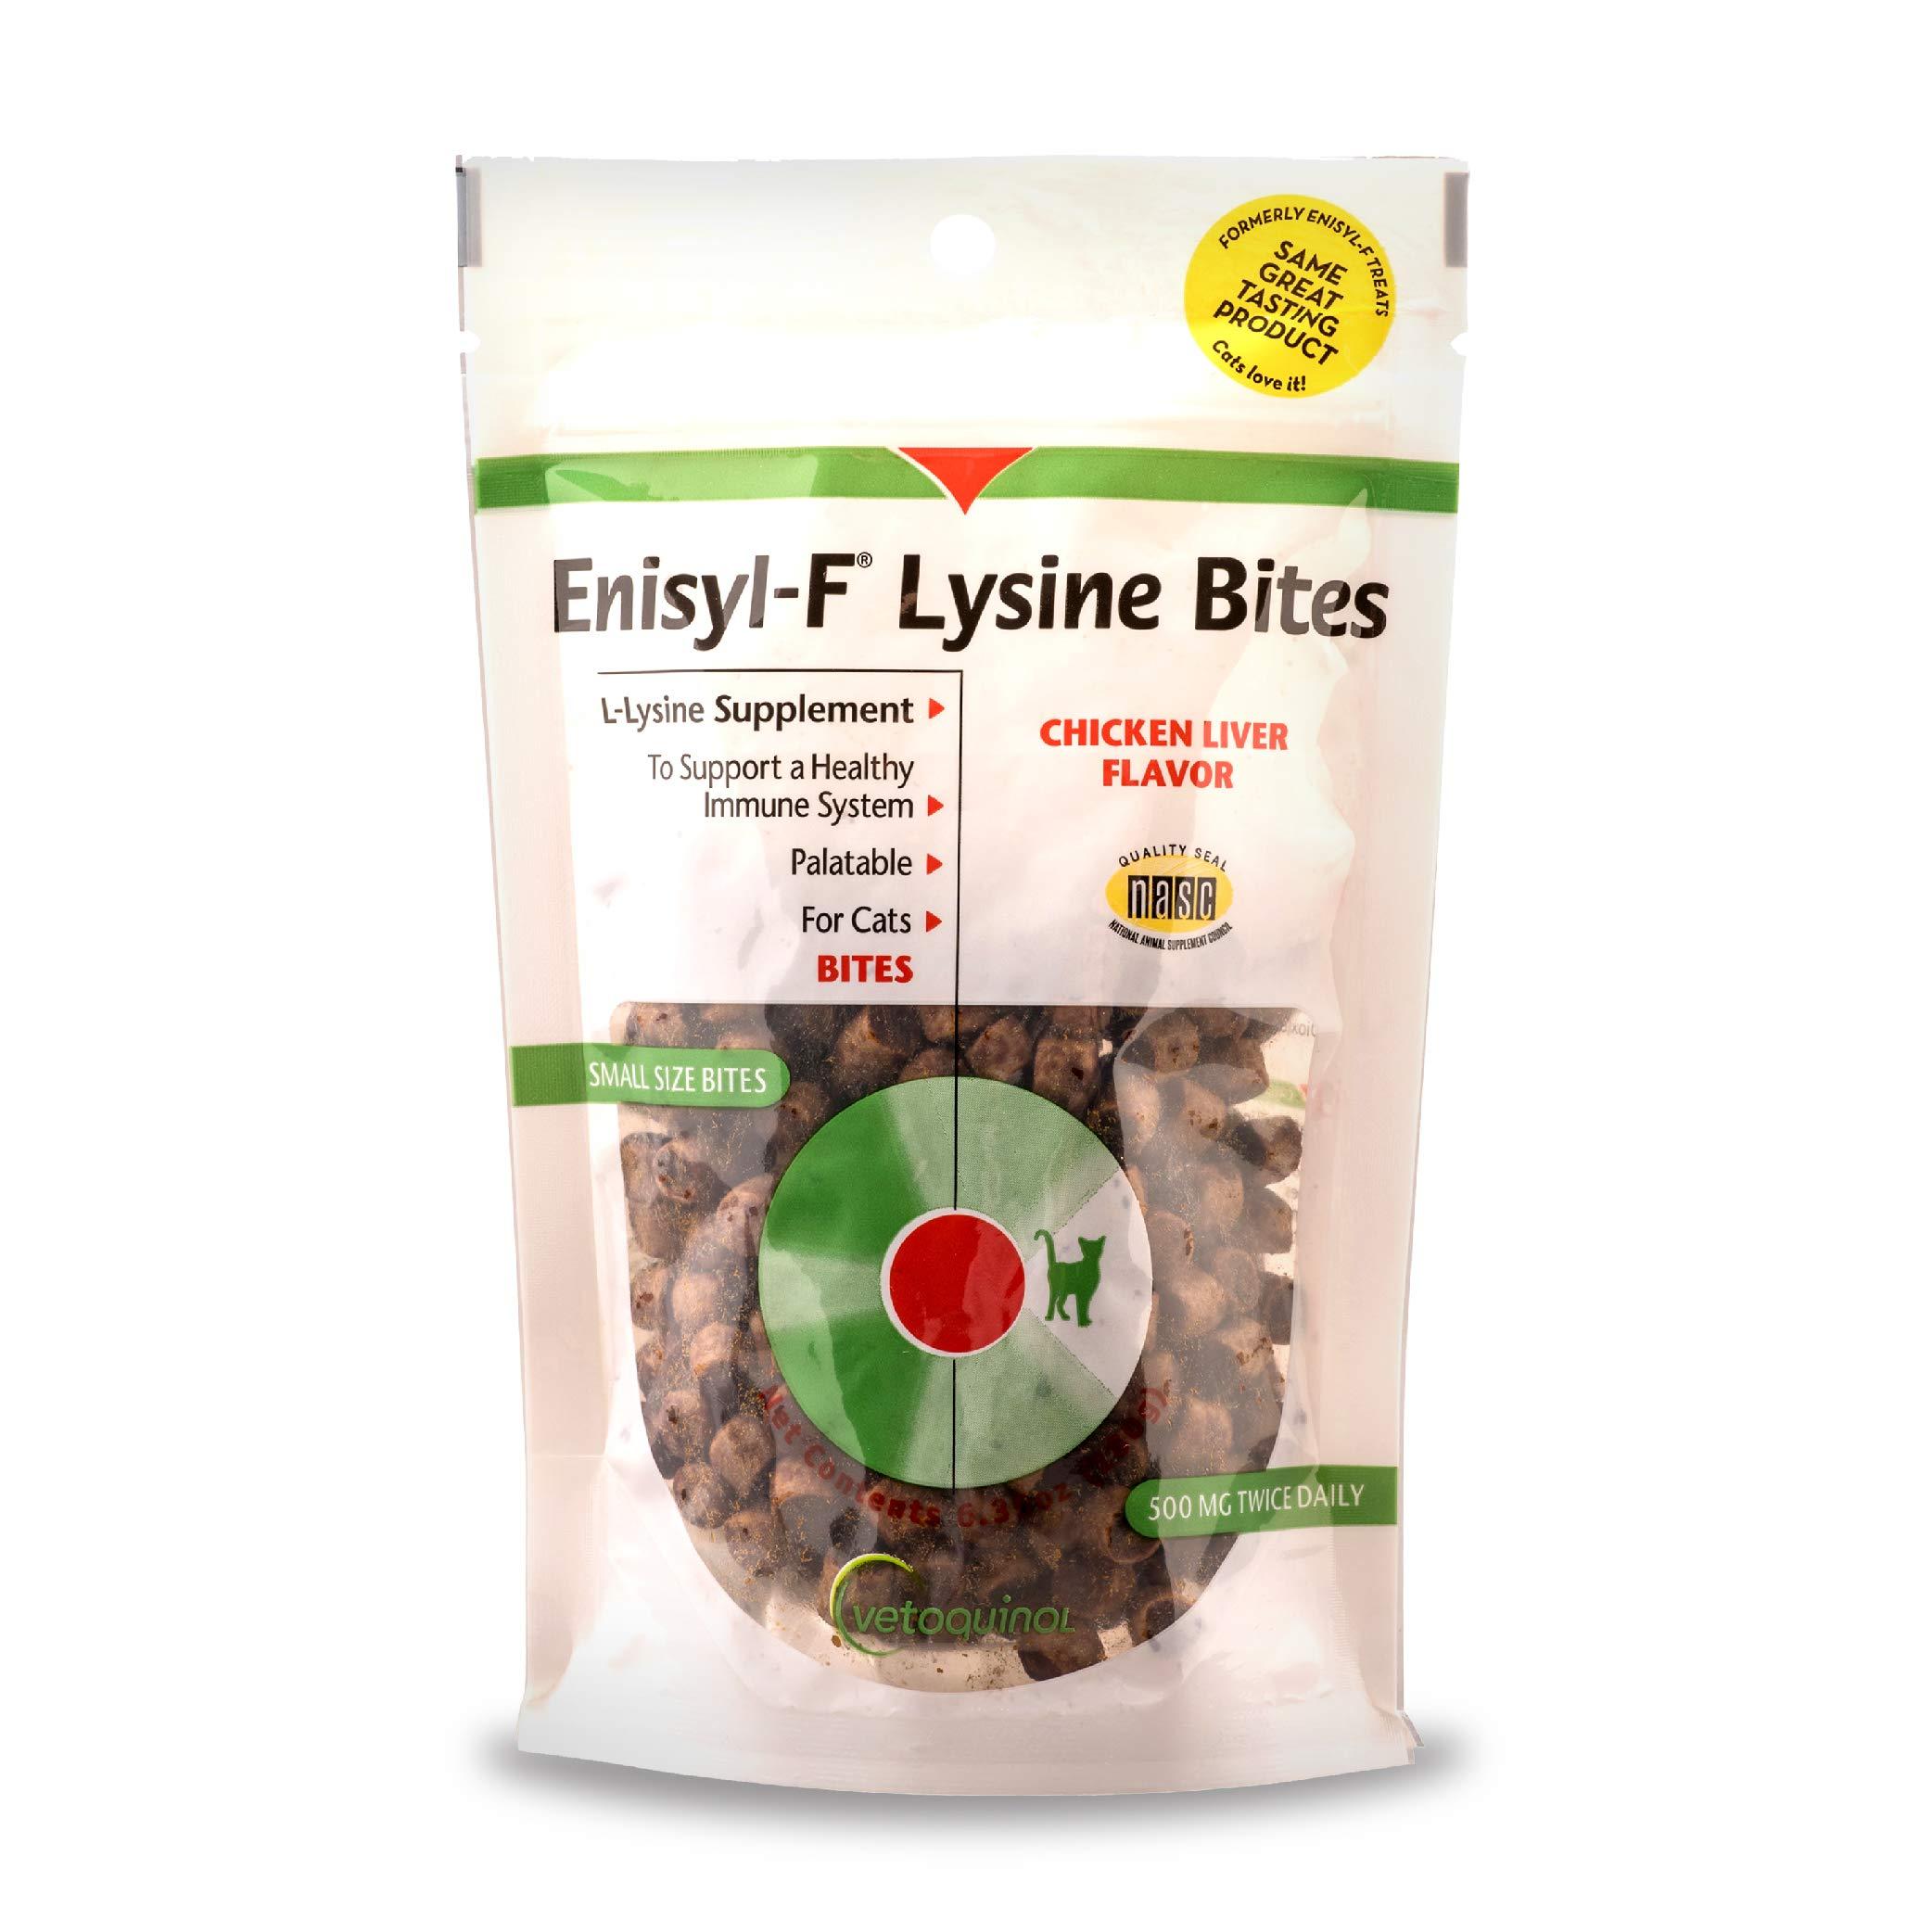 Vetoquinol Enisyl-F Lysine Bites: L-Lysine Treats for Cats & Kittens - Chicken Liver-Flavored Chews, 6.4oz (180g) Reclosable Bag by Vetoquinol